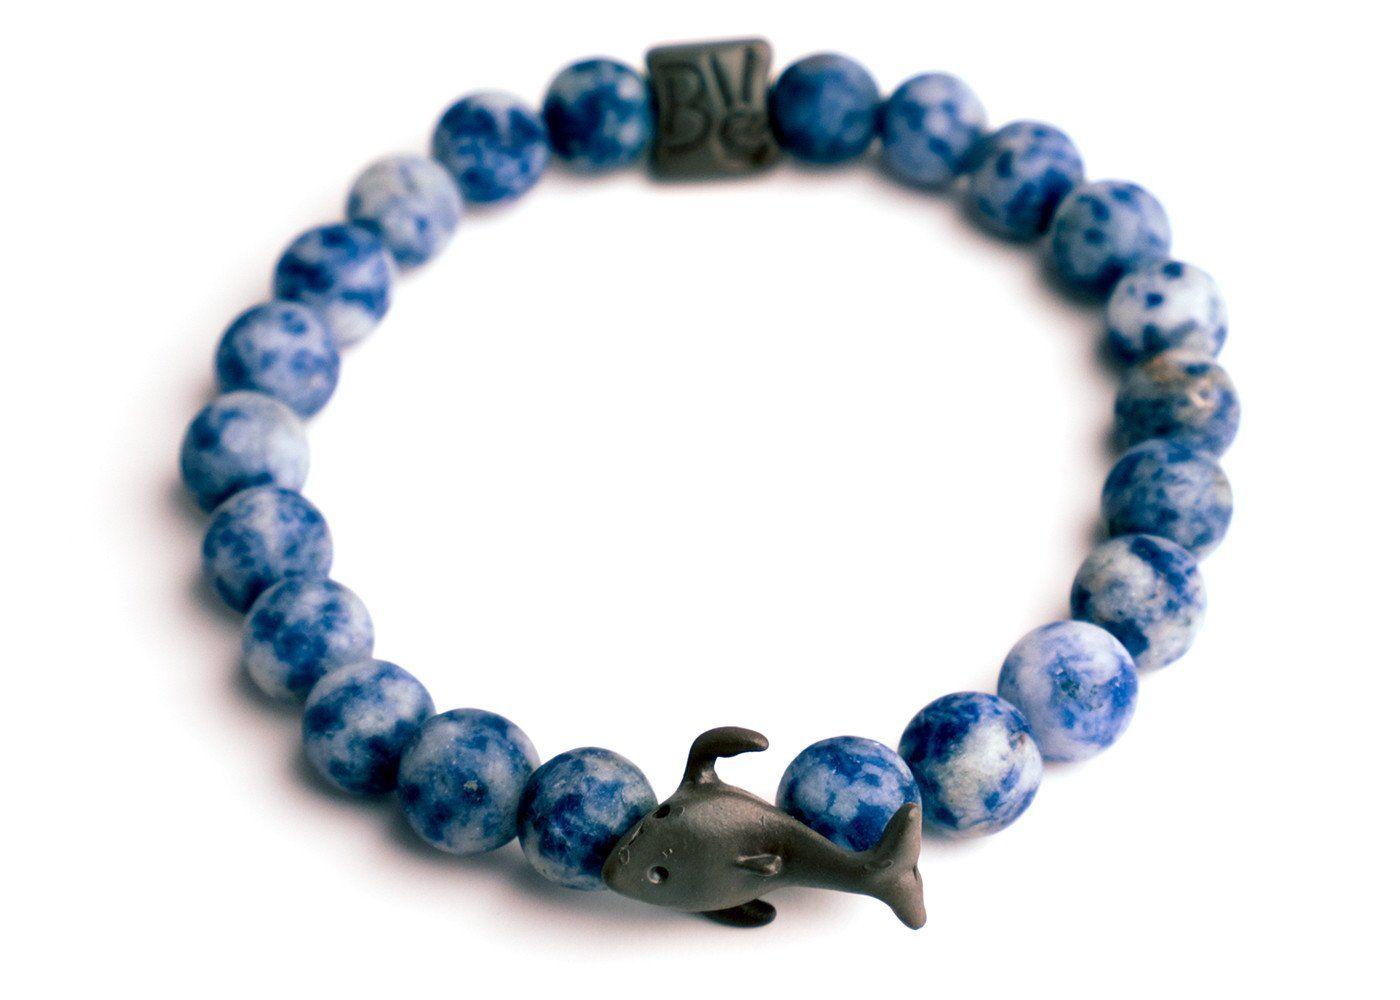 51acd89410c8e My Buena Vida June Edition: Whale Bracelet | My Buena Vida Limited ...